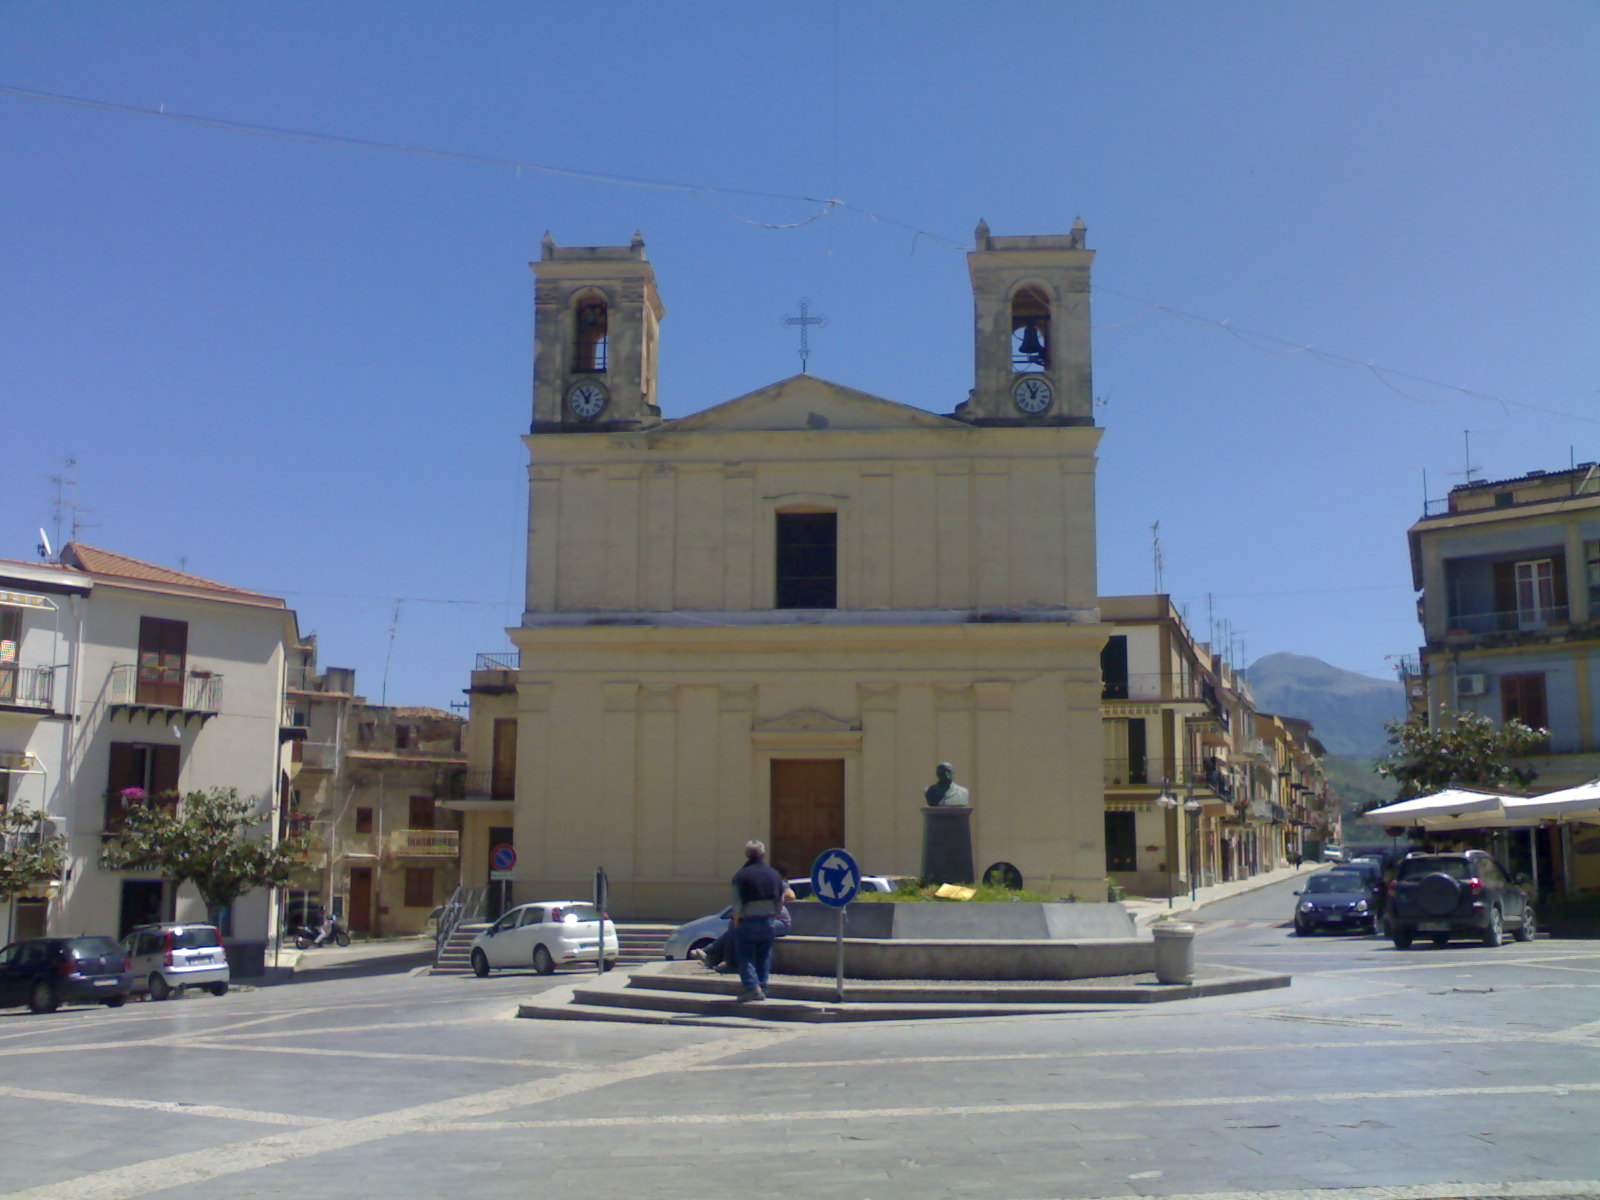 Campofelice di Roccella Italy  city photos gallery : Campofelice di Roccella Wikimedia Commons